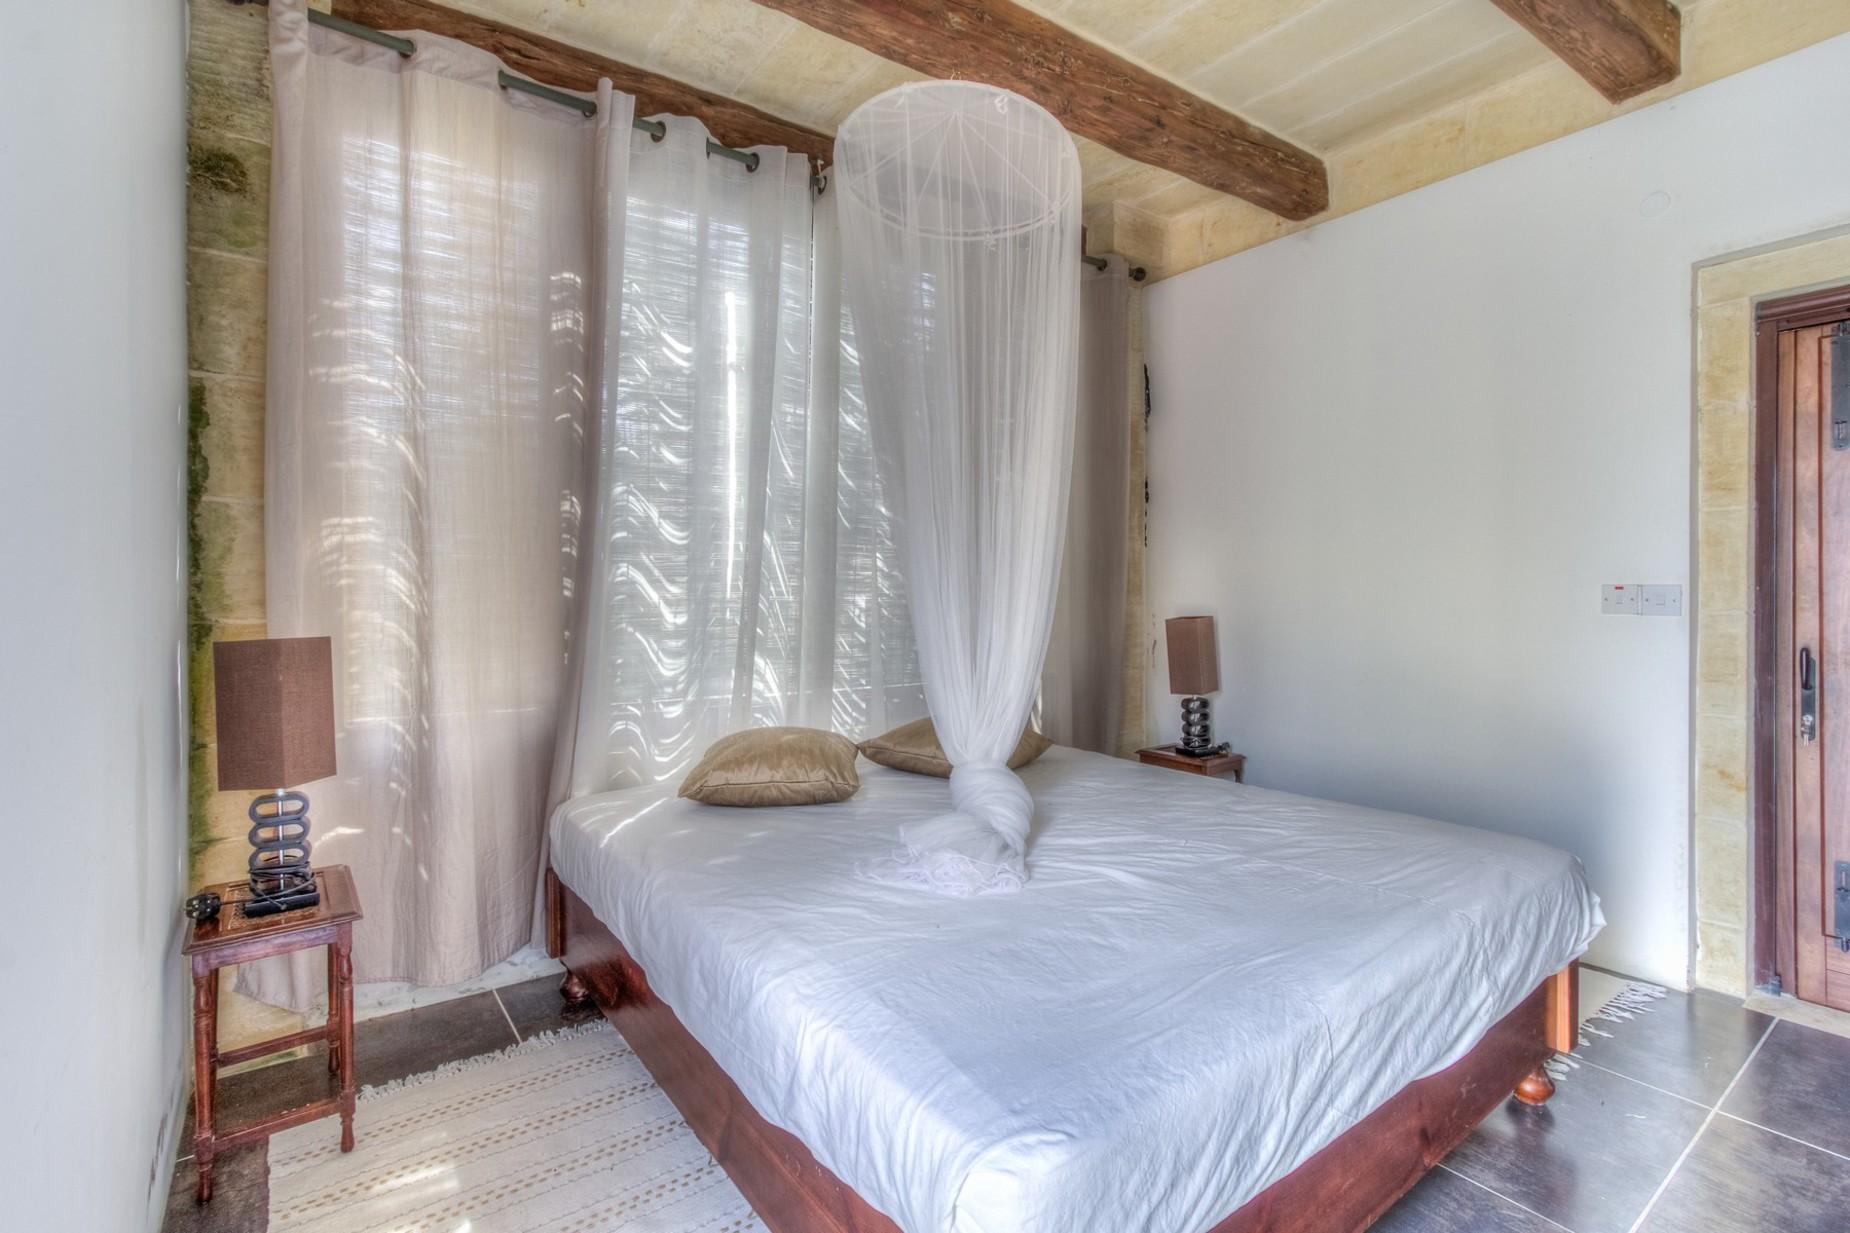 6 bed Farmhouse For Sale in San Lawrenz, San Lawrenz - thumb 18